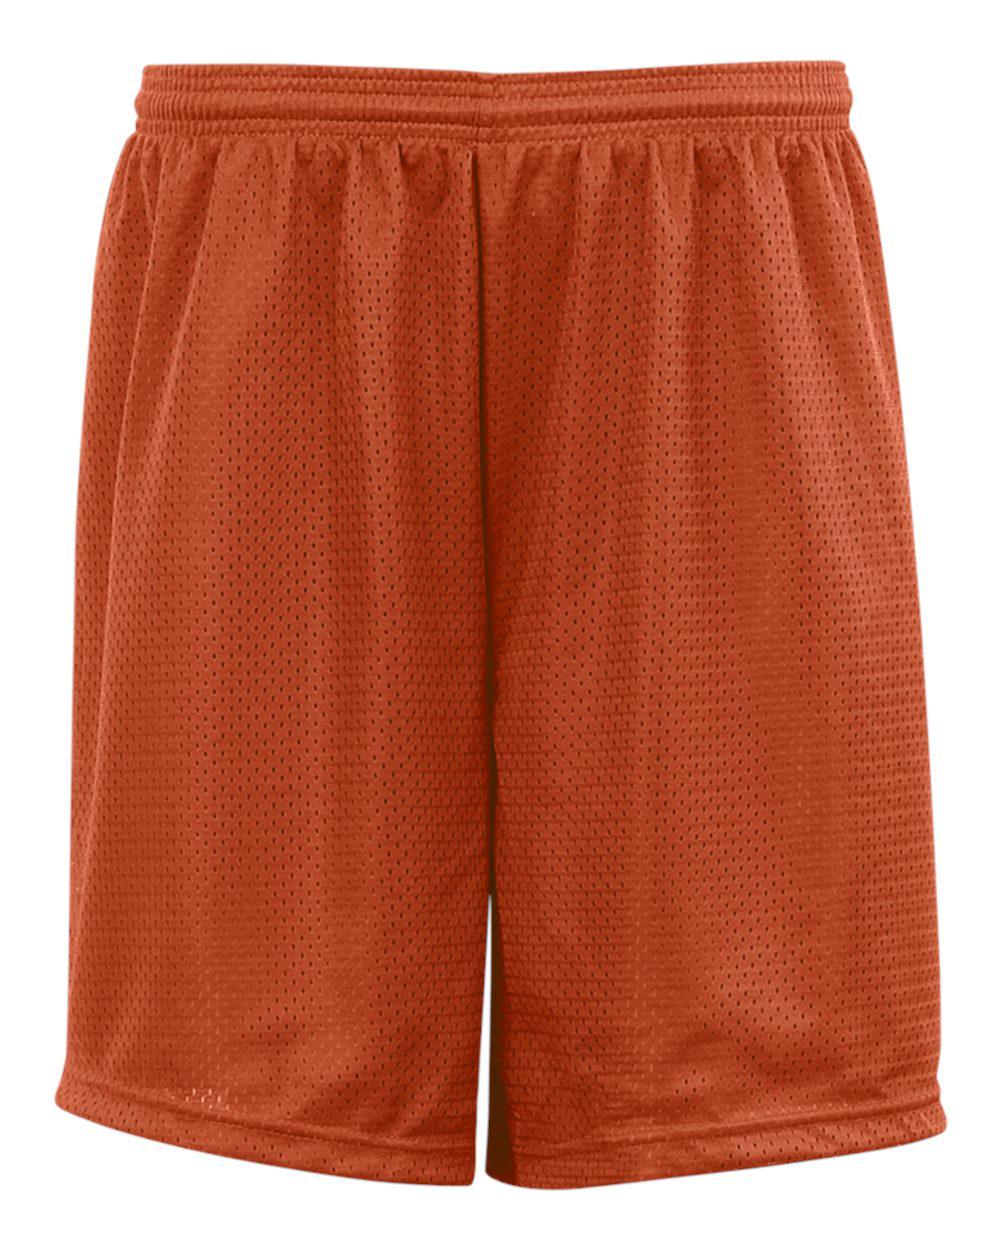 Mesh/Tricot 9 Inch Short - Burnt Orange